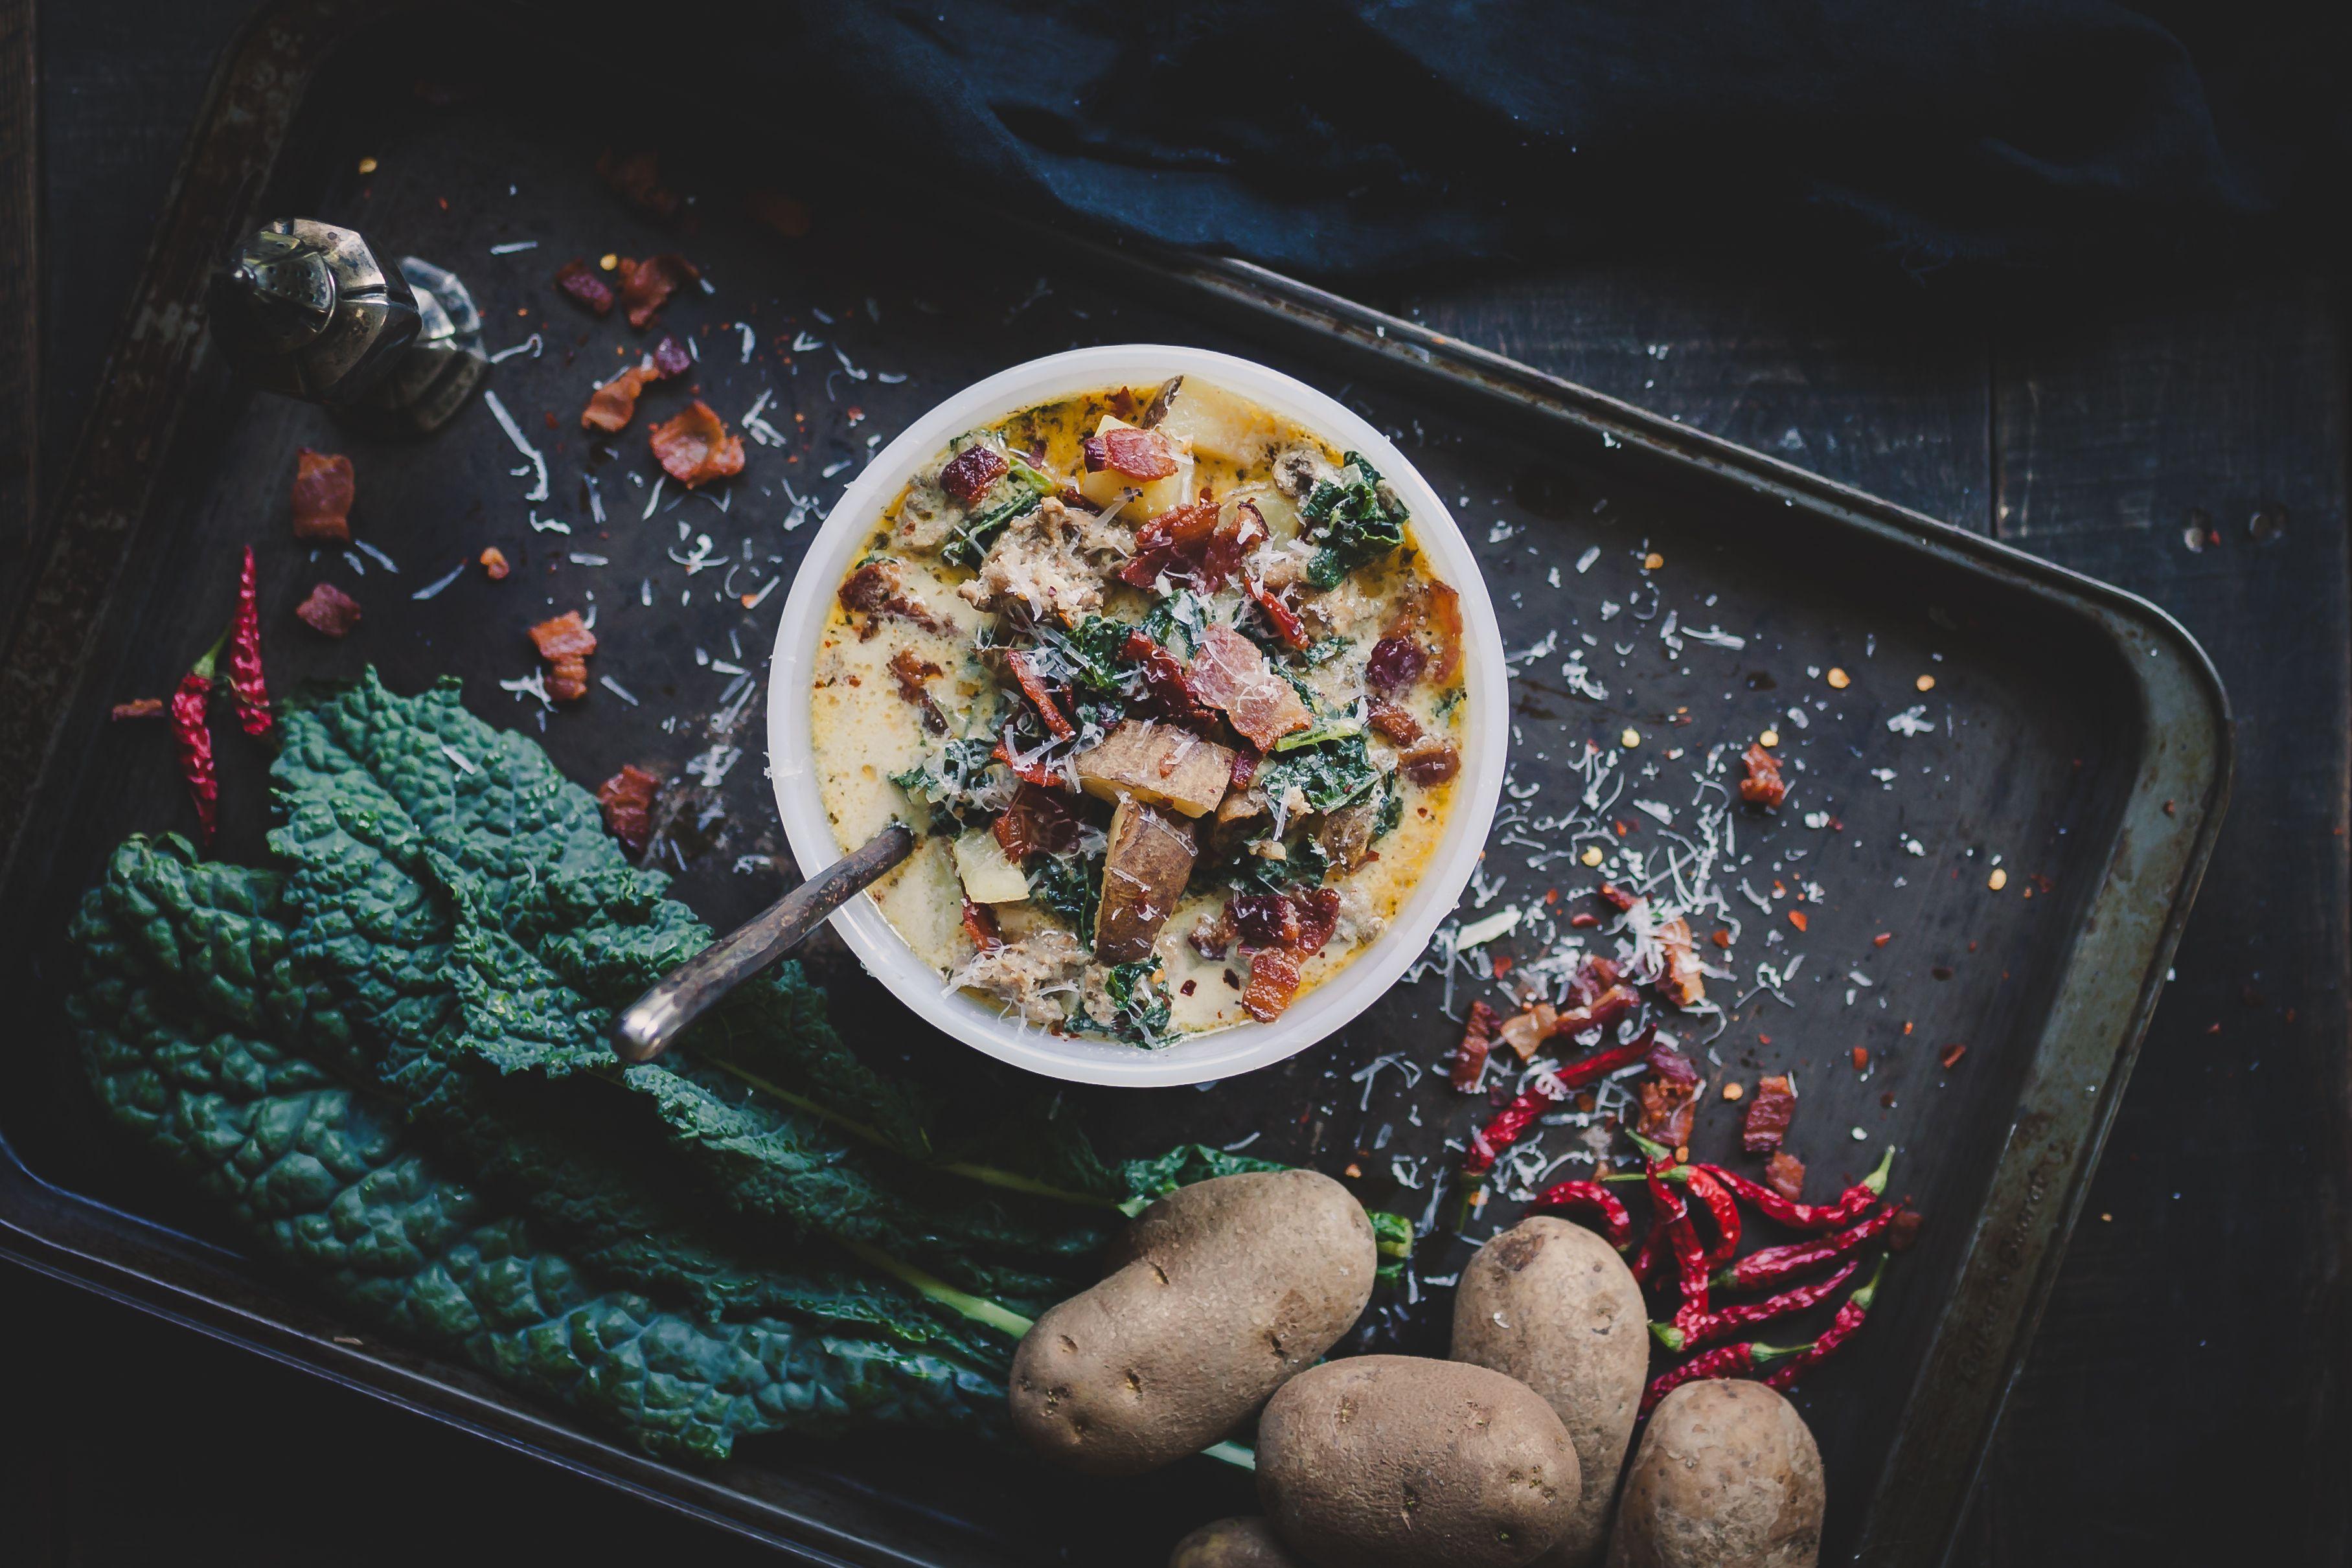 Zuppa Toscana Soup #zuppatoscanasoup Zuppa Toscana Soup #zuppatoscanasoup